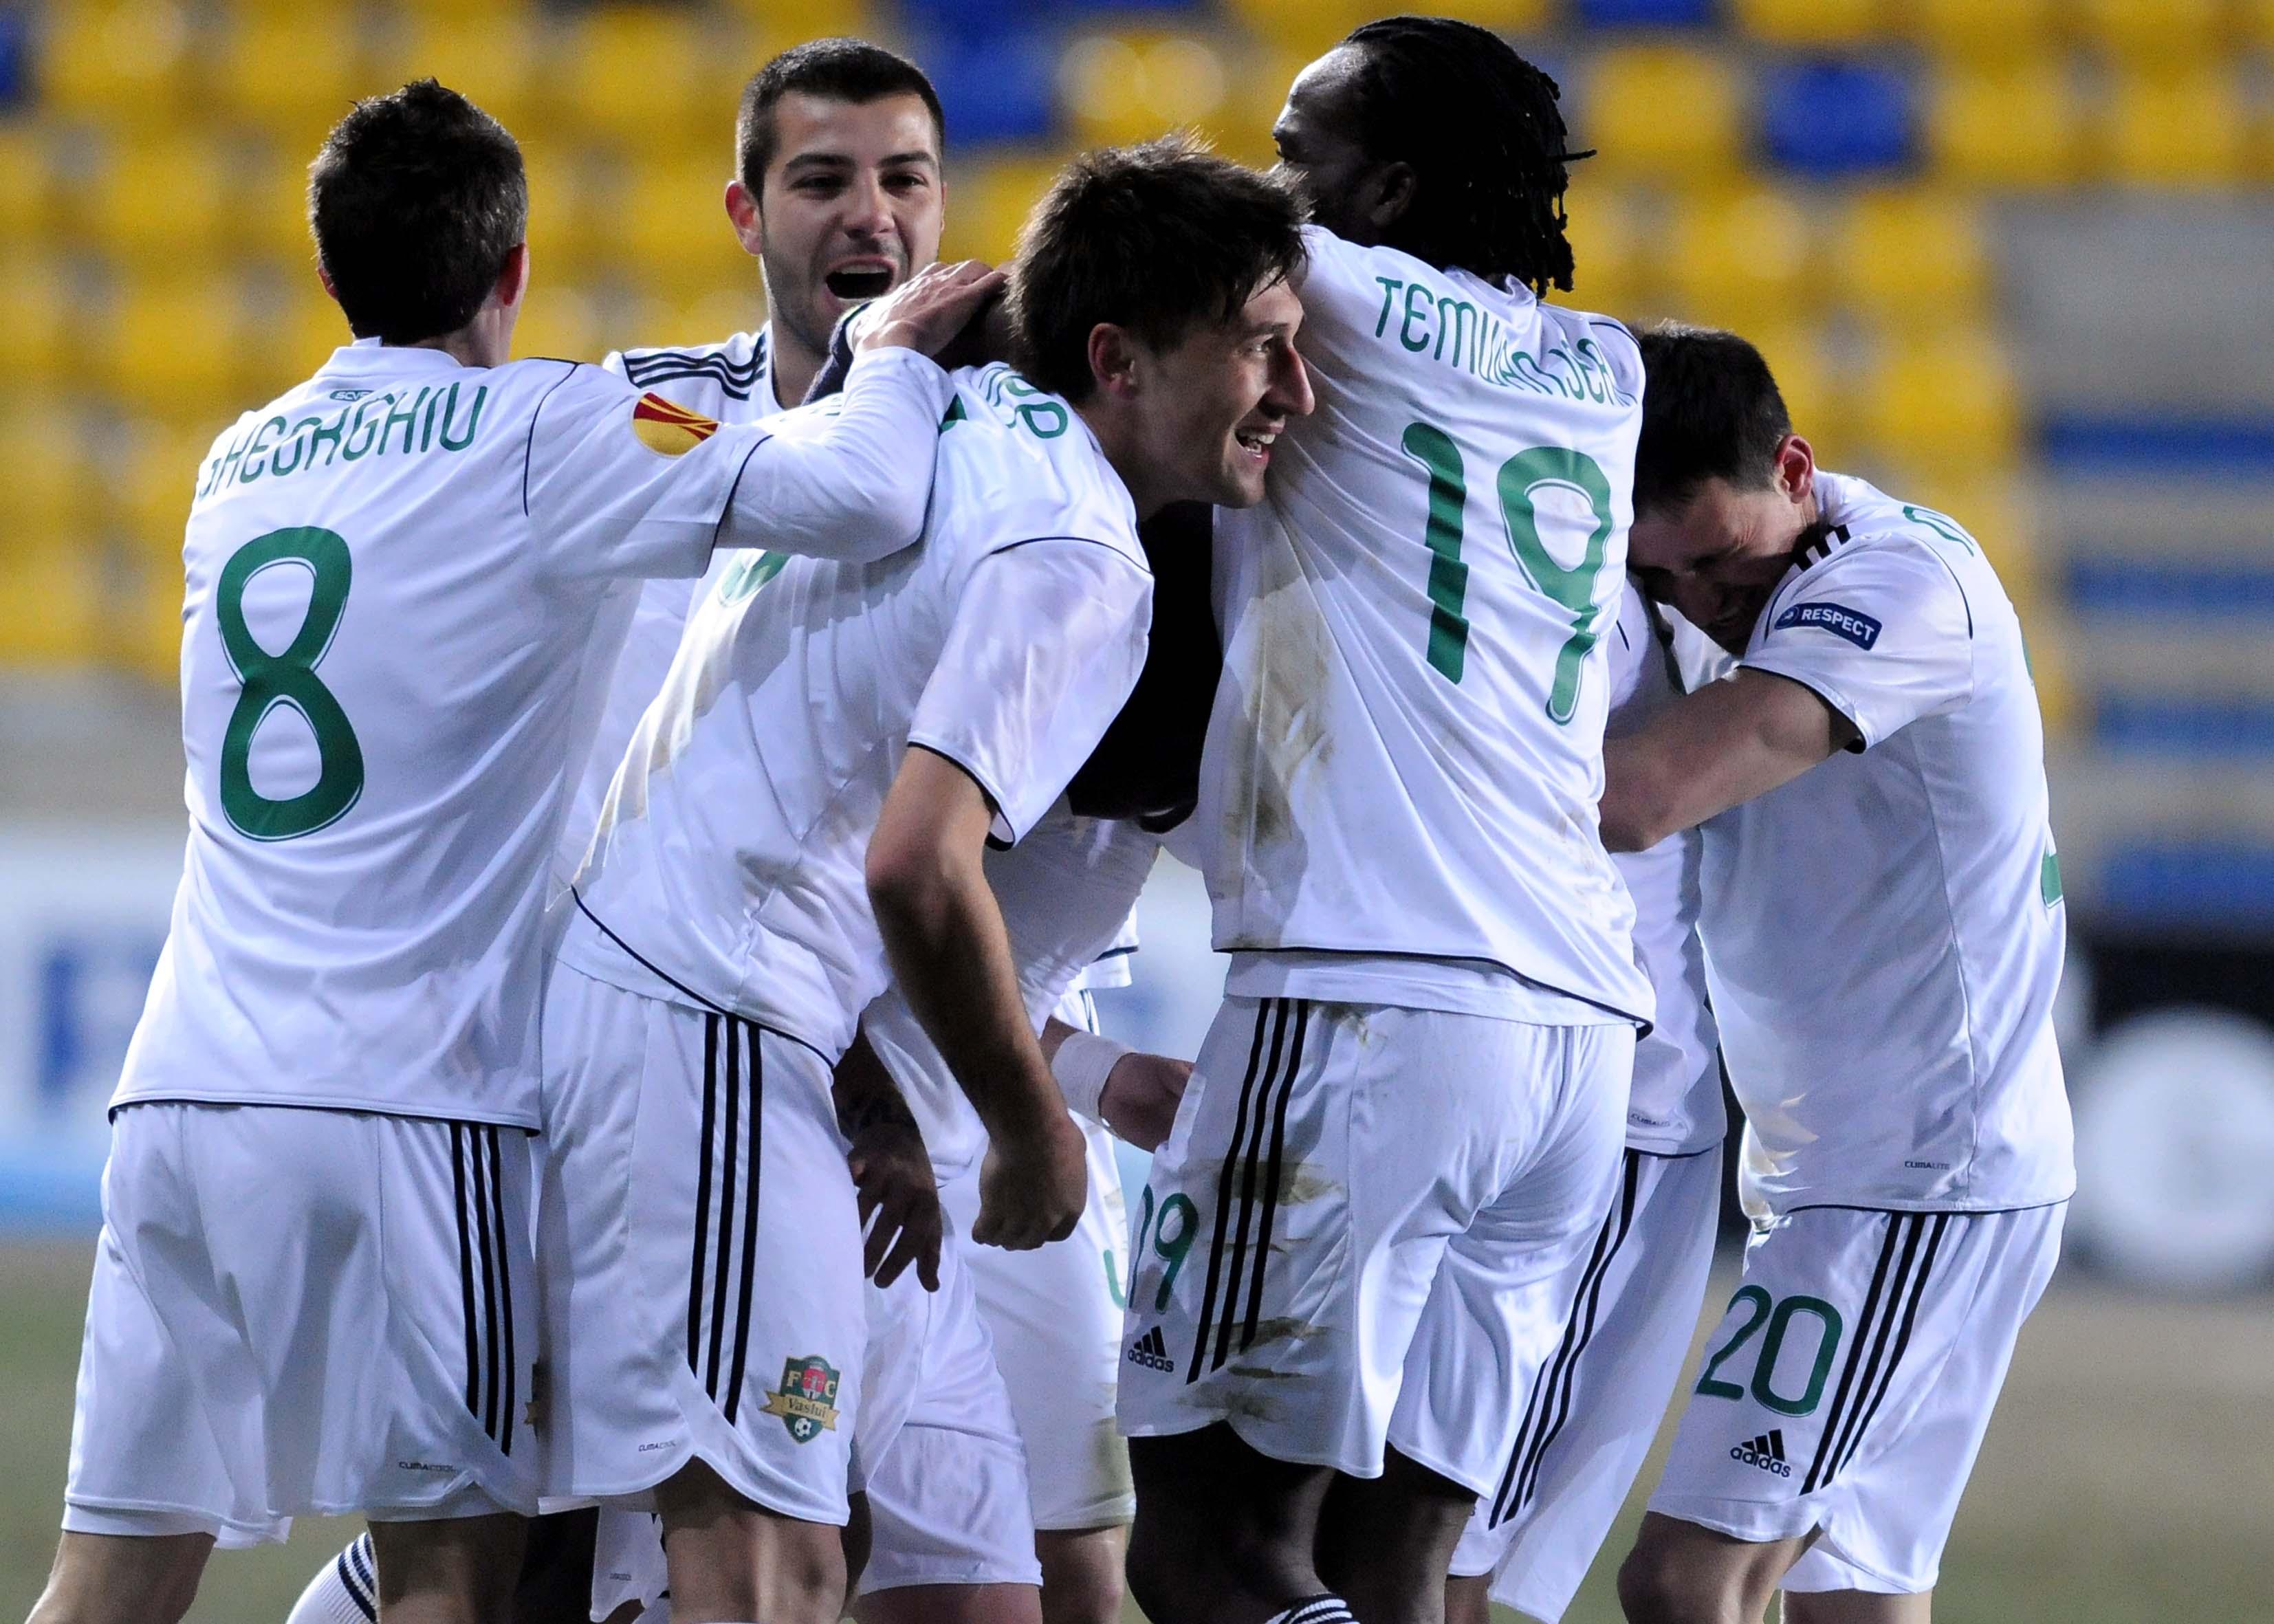 3.FOTBAL:FC PETROLUL PLOIESTI-FC VASLUI 1-2,LIGA 1 (4.03.2012)